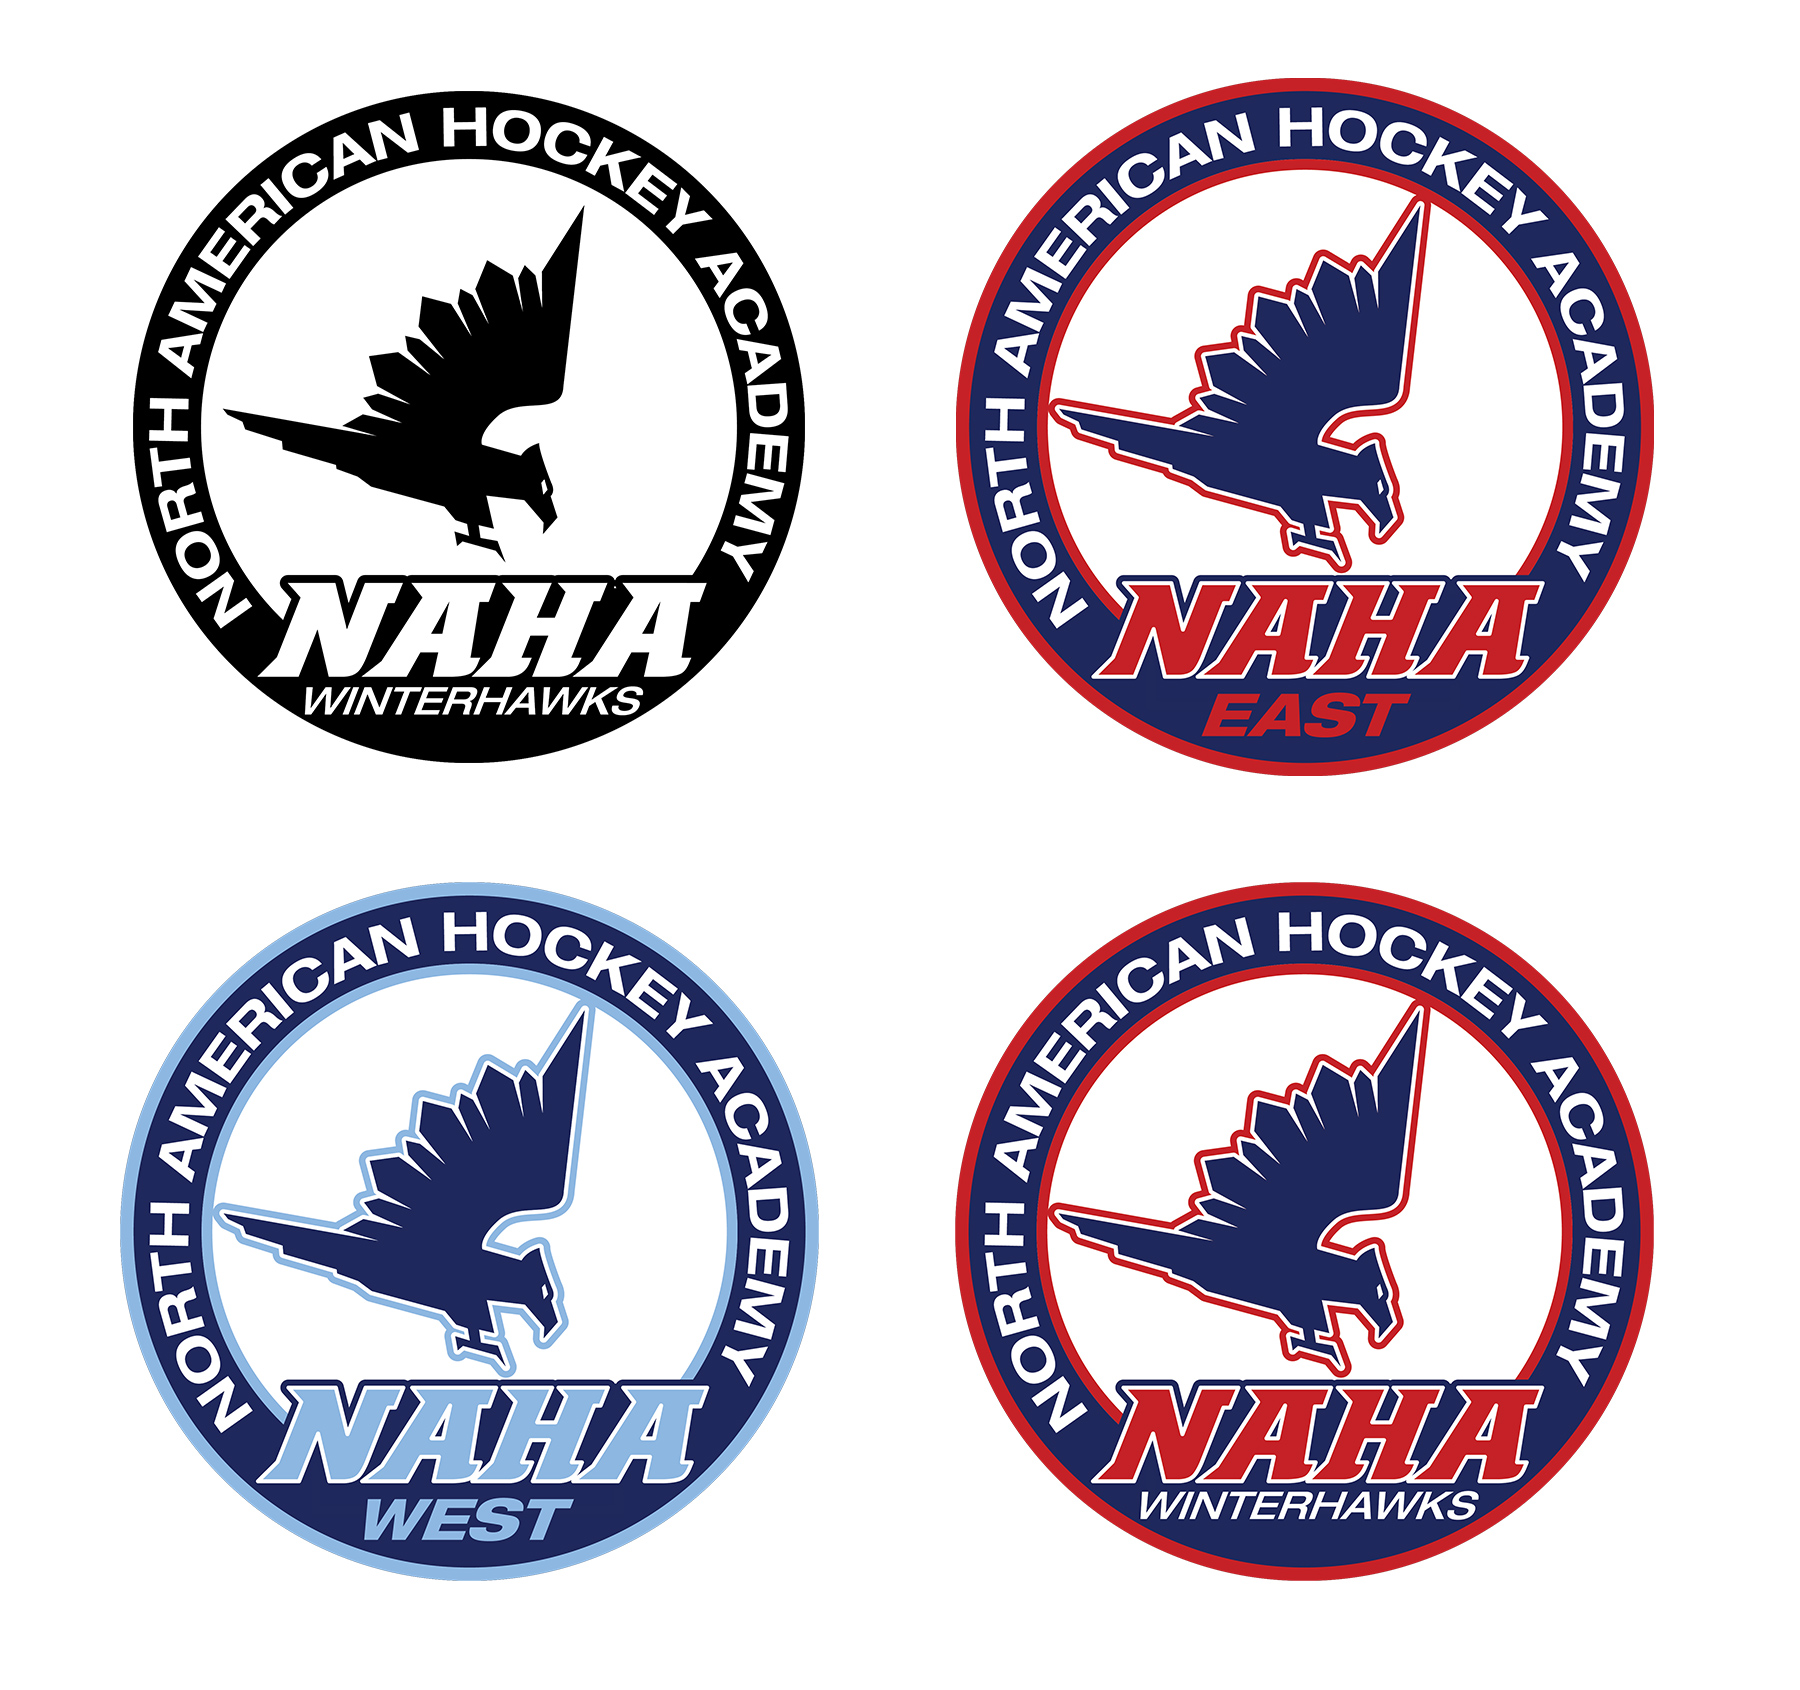 naha_round_logos.jpg